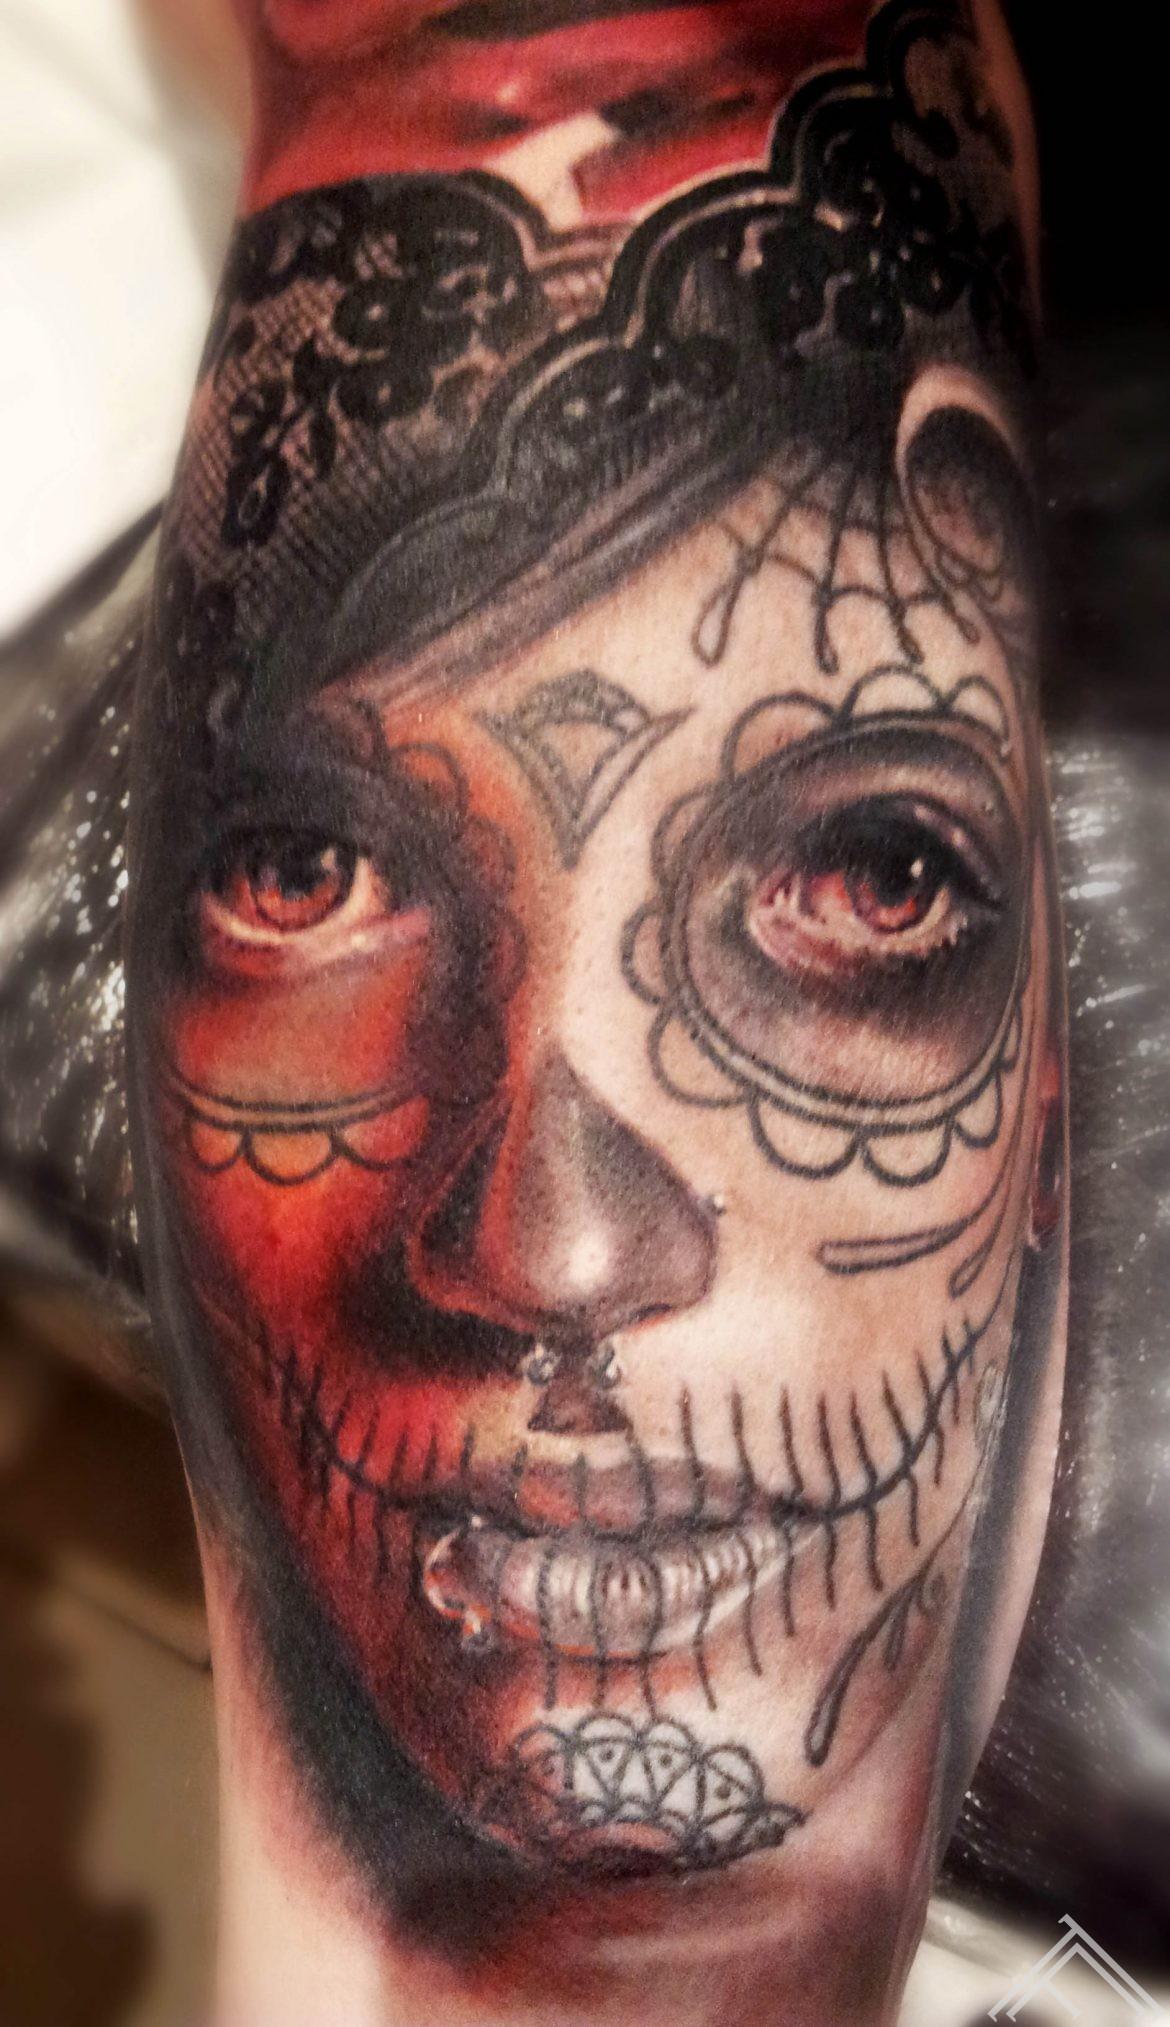 tattoo-muerte-girl-sexy-lace-roses-marispavlo-tattoofrequency